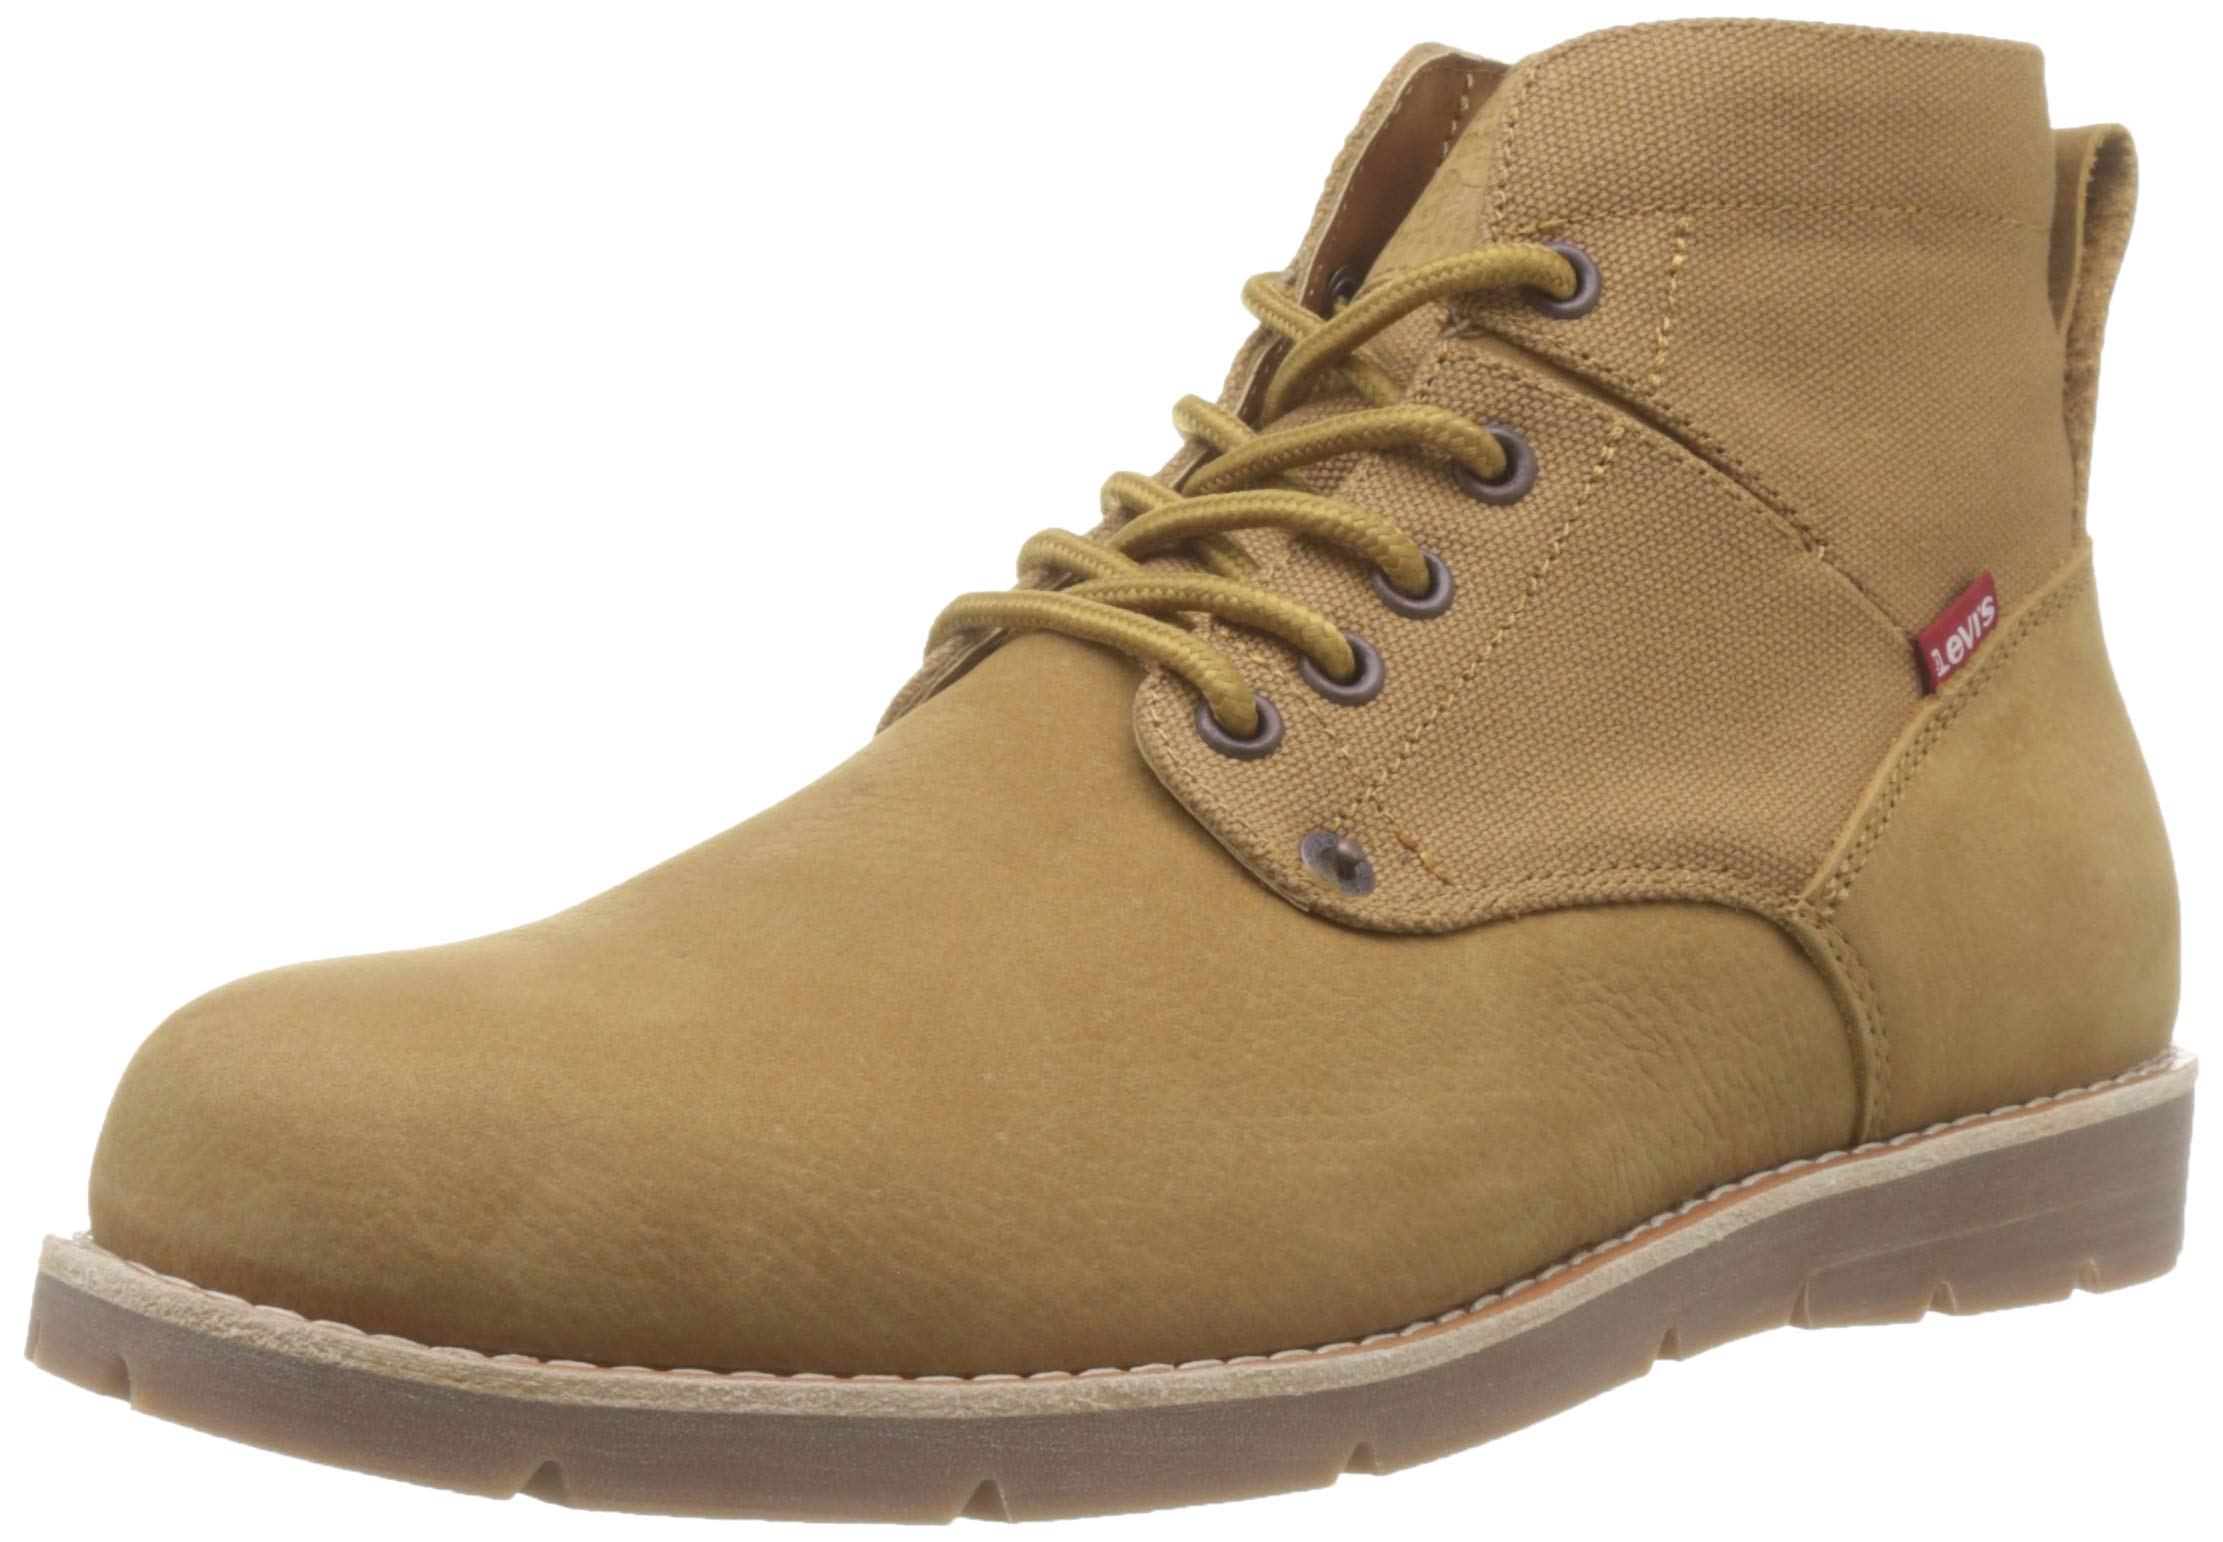 Levi's Men's Jax Desert Boots 1